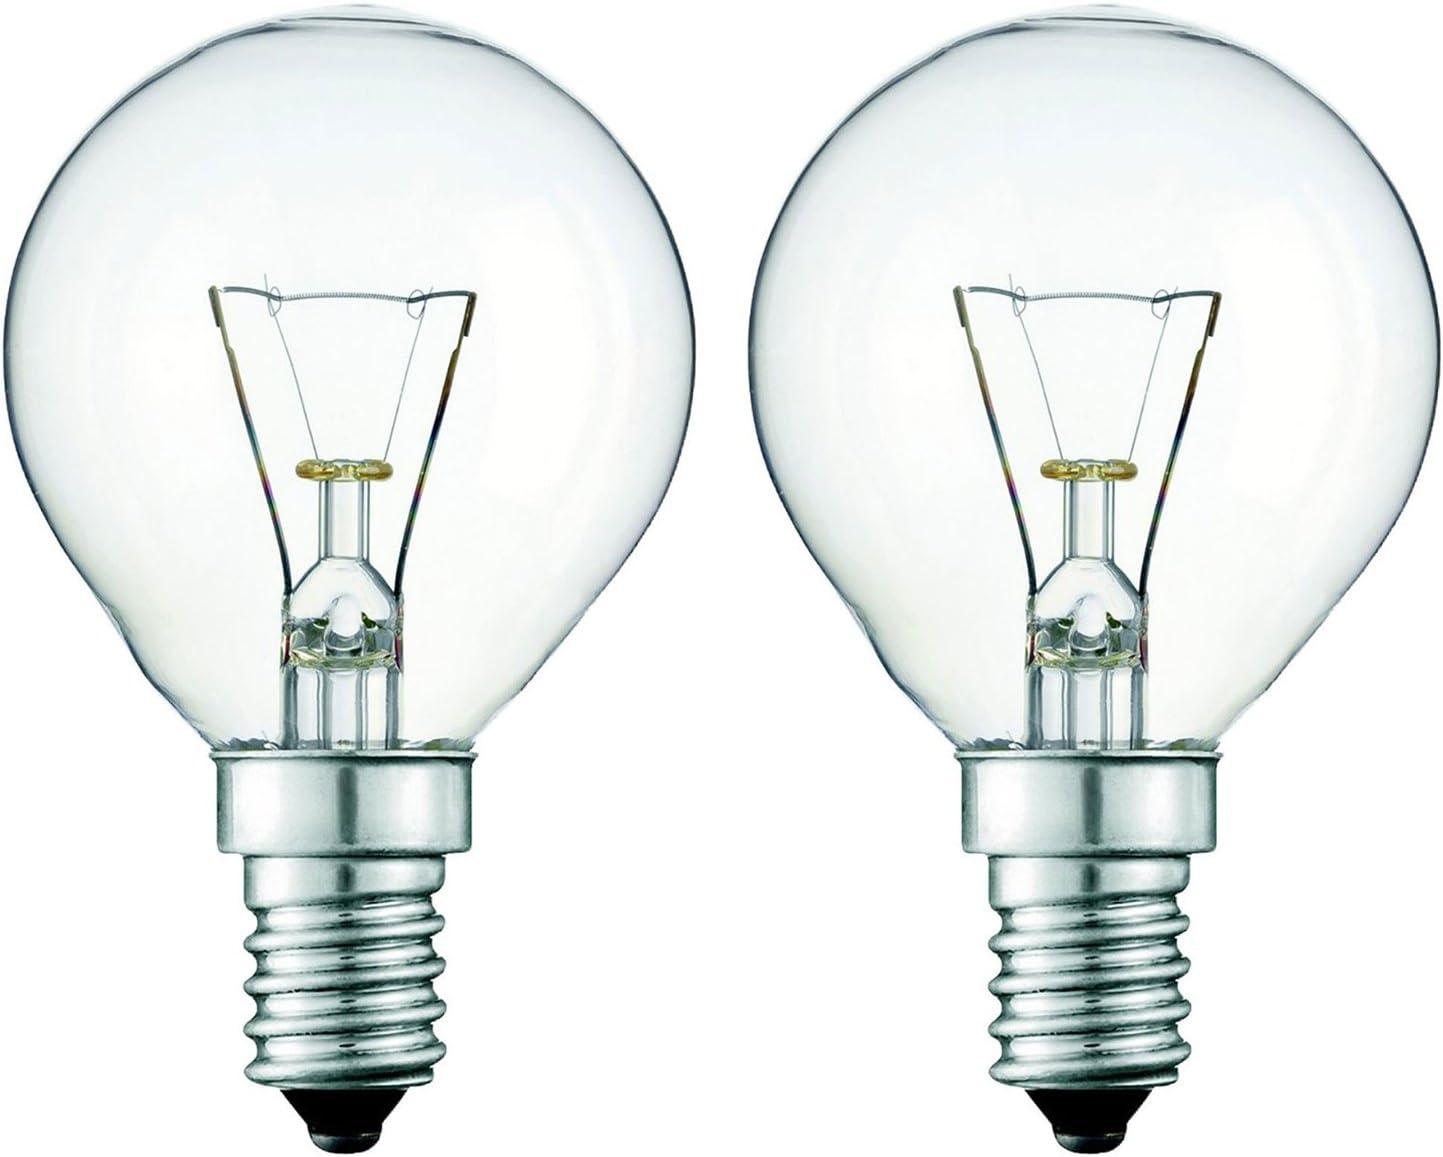 2 x Eveready 220-240V 25w 300°C Oven Kitchen Appliance Lamp SES E14 Bulb Pygmy